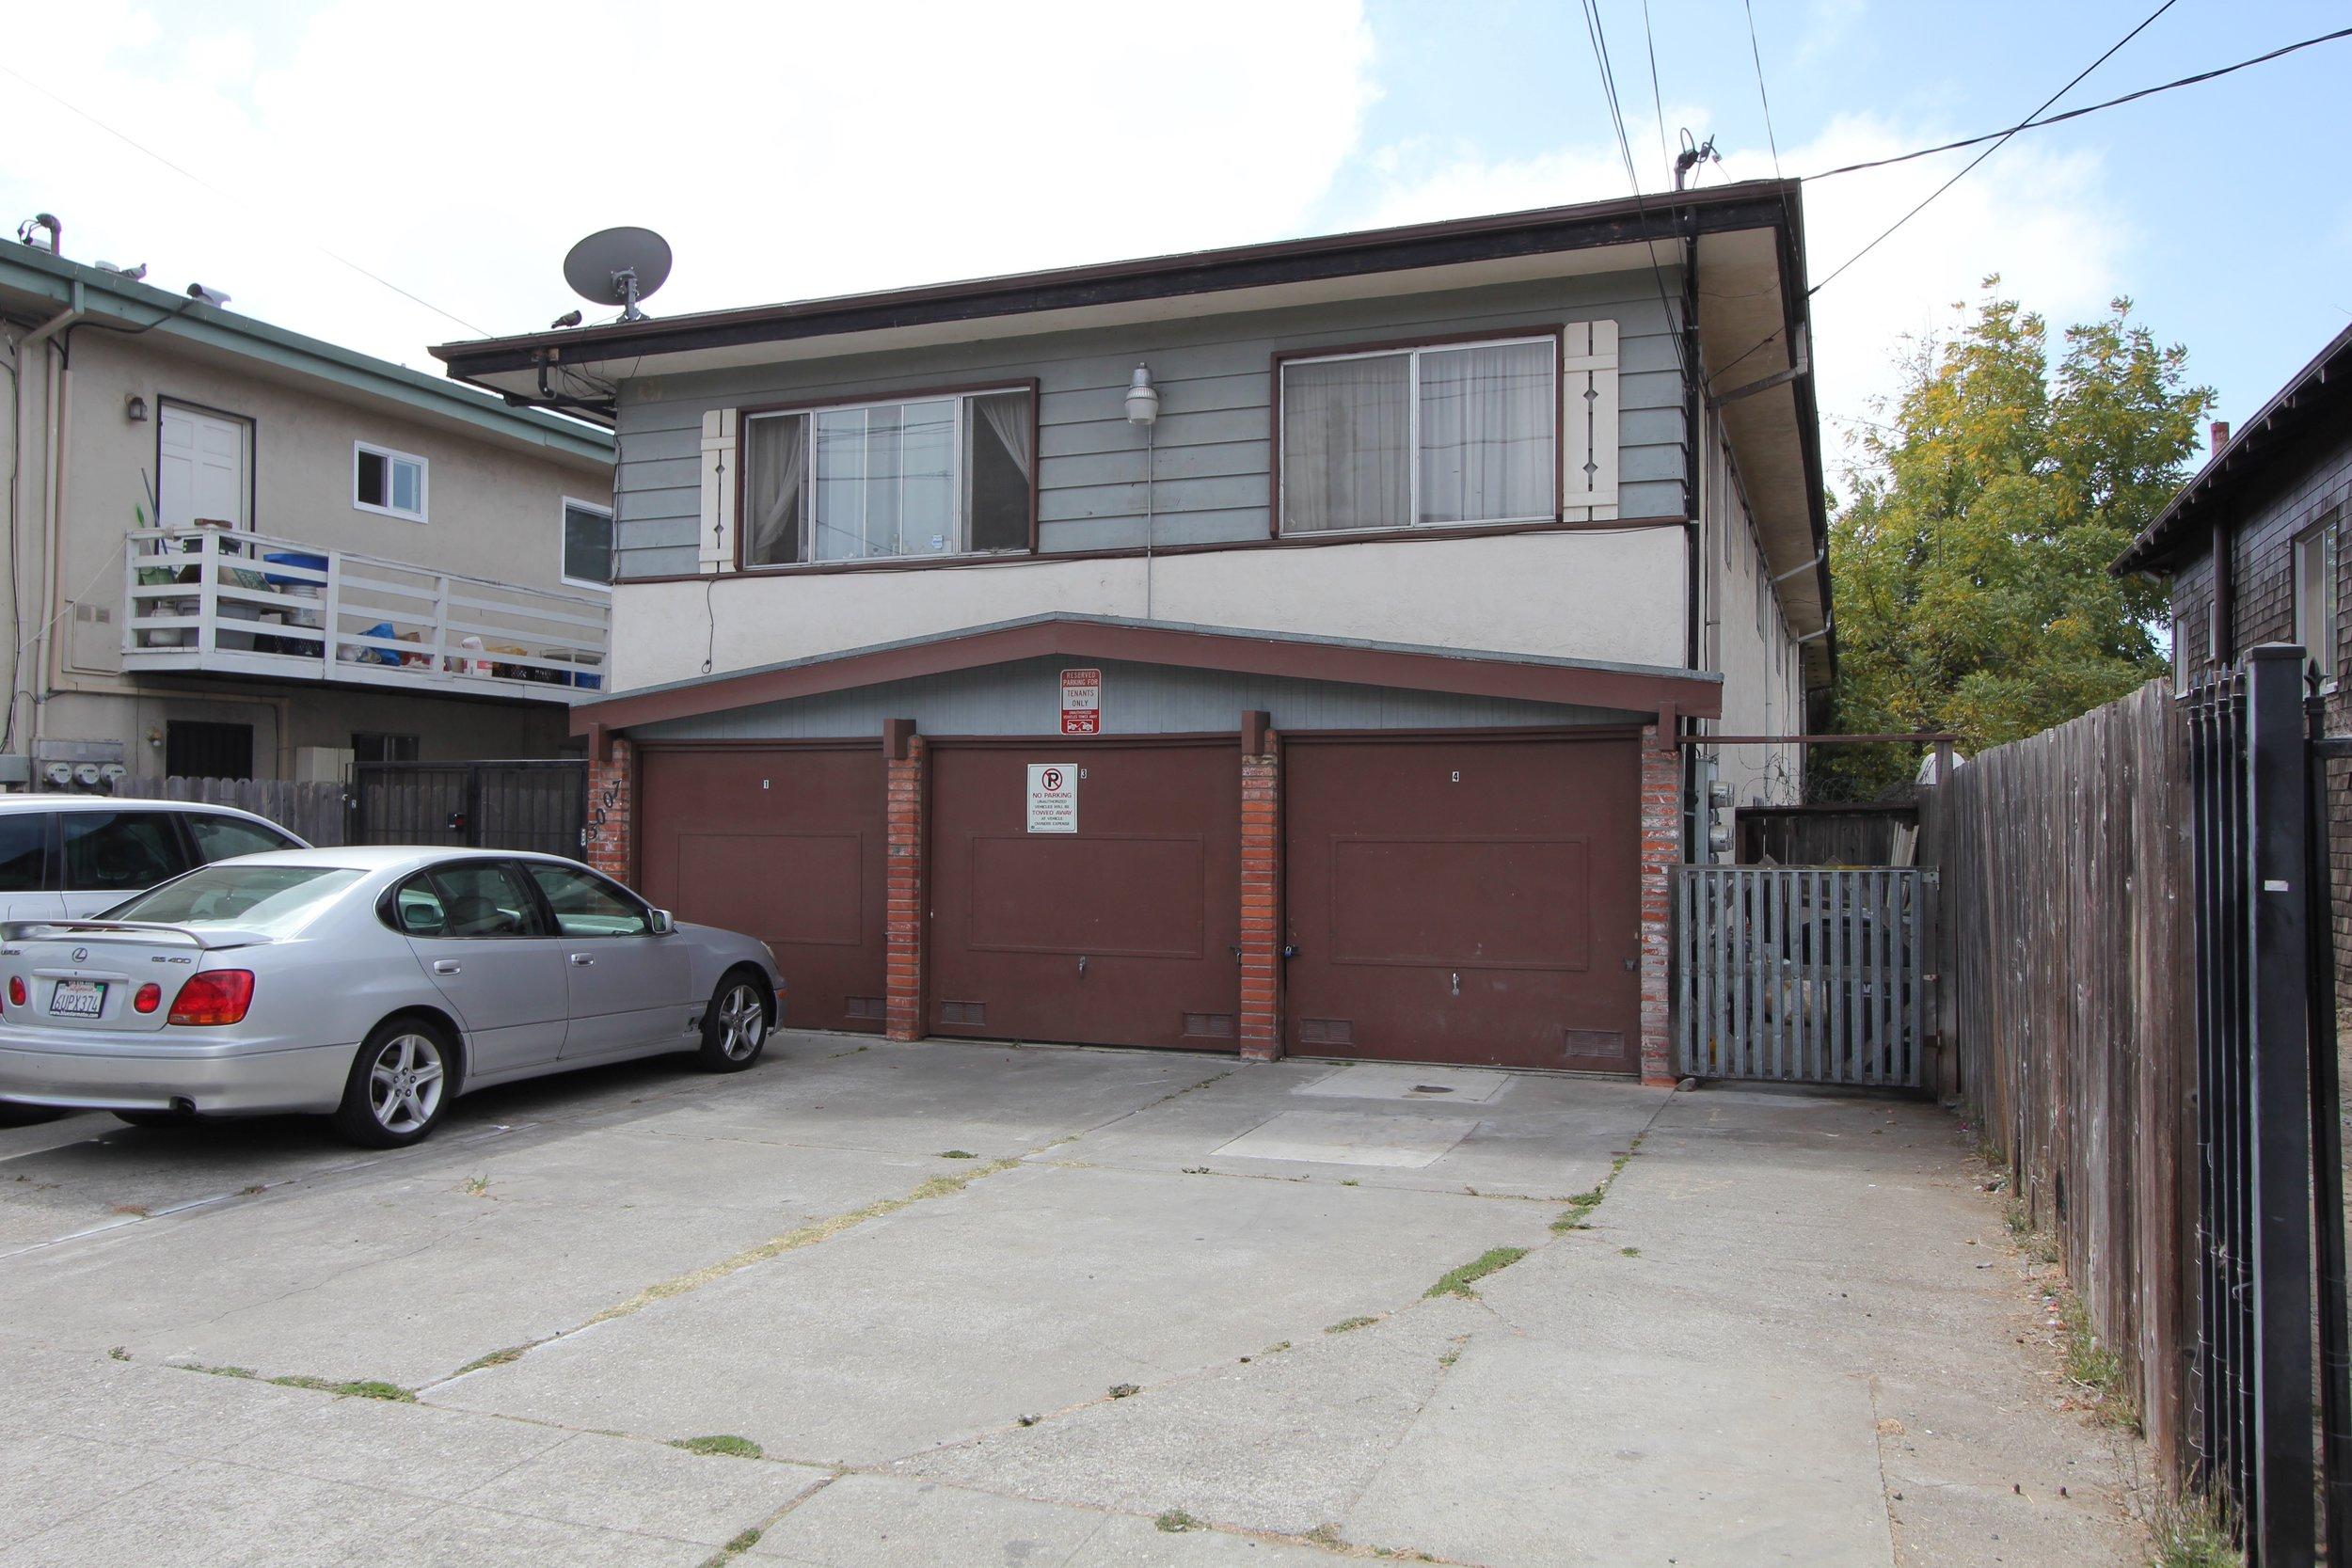 San Francisco Real Estate | Palo Alto Real Estate | Bay Area Real Estate | Bay Area Property Management | San Francisco Property management